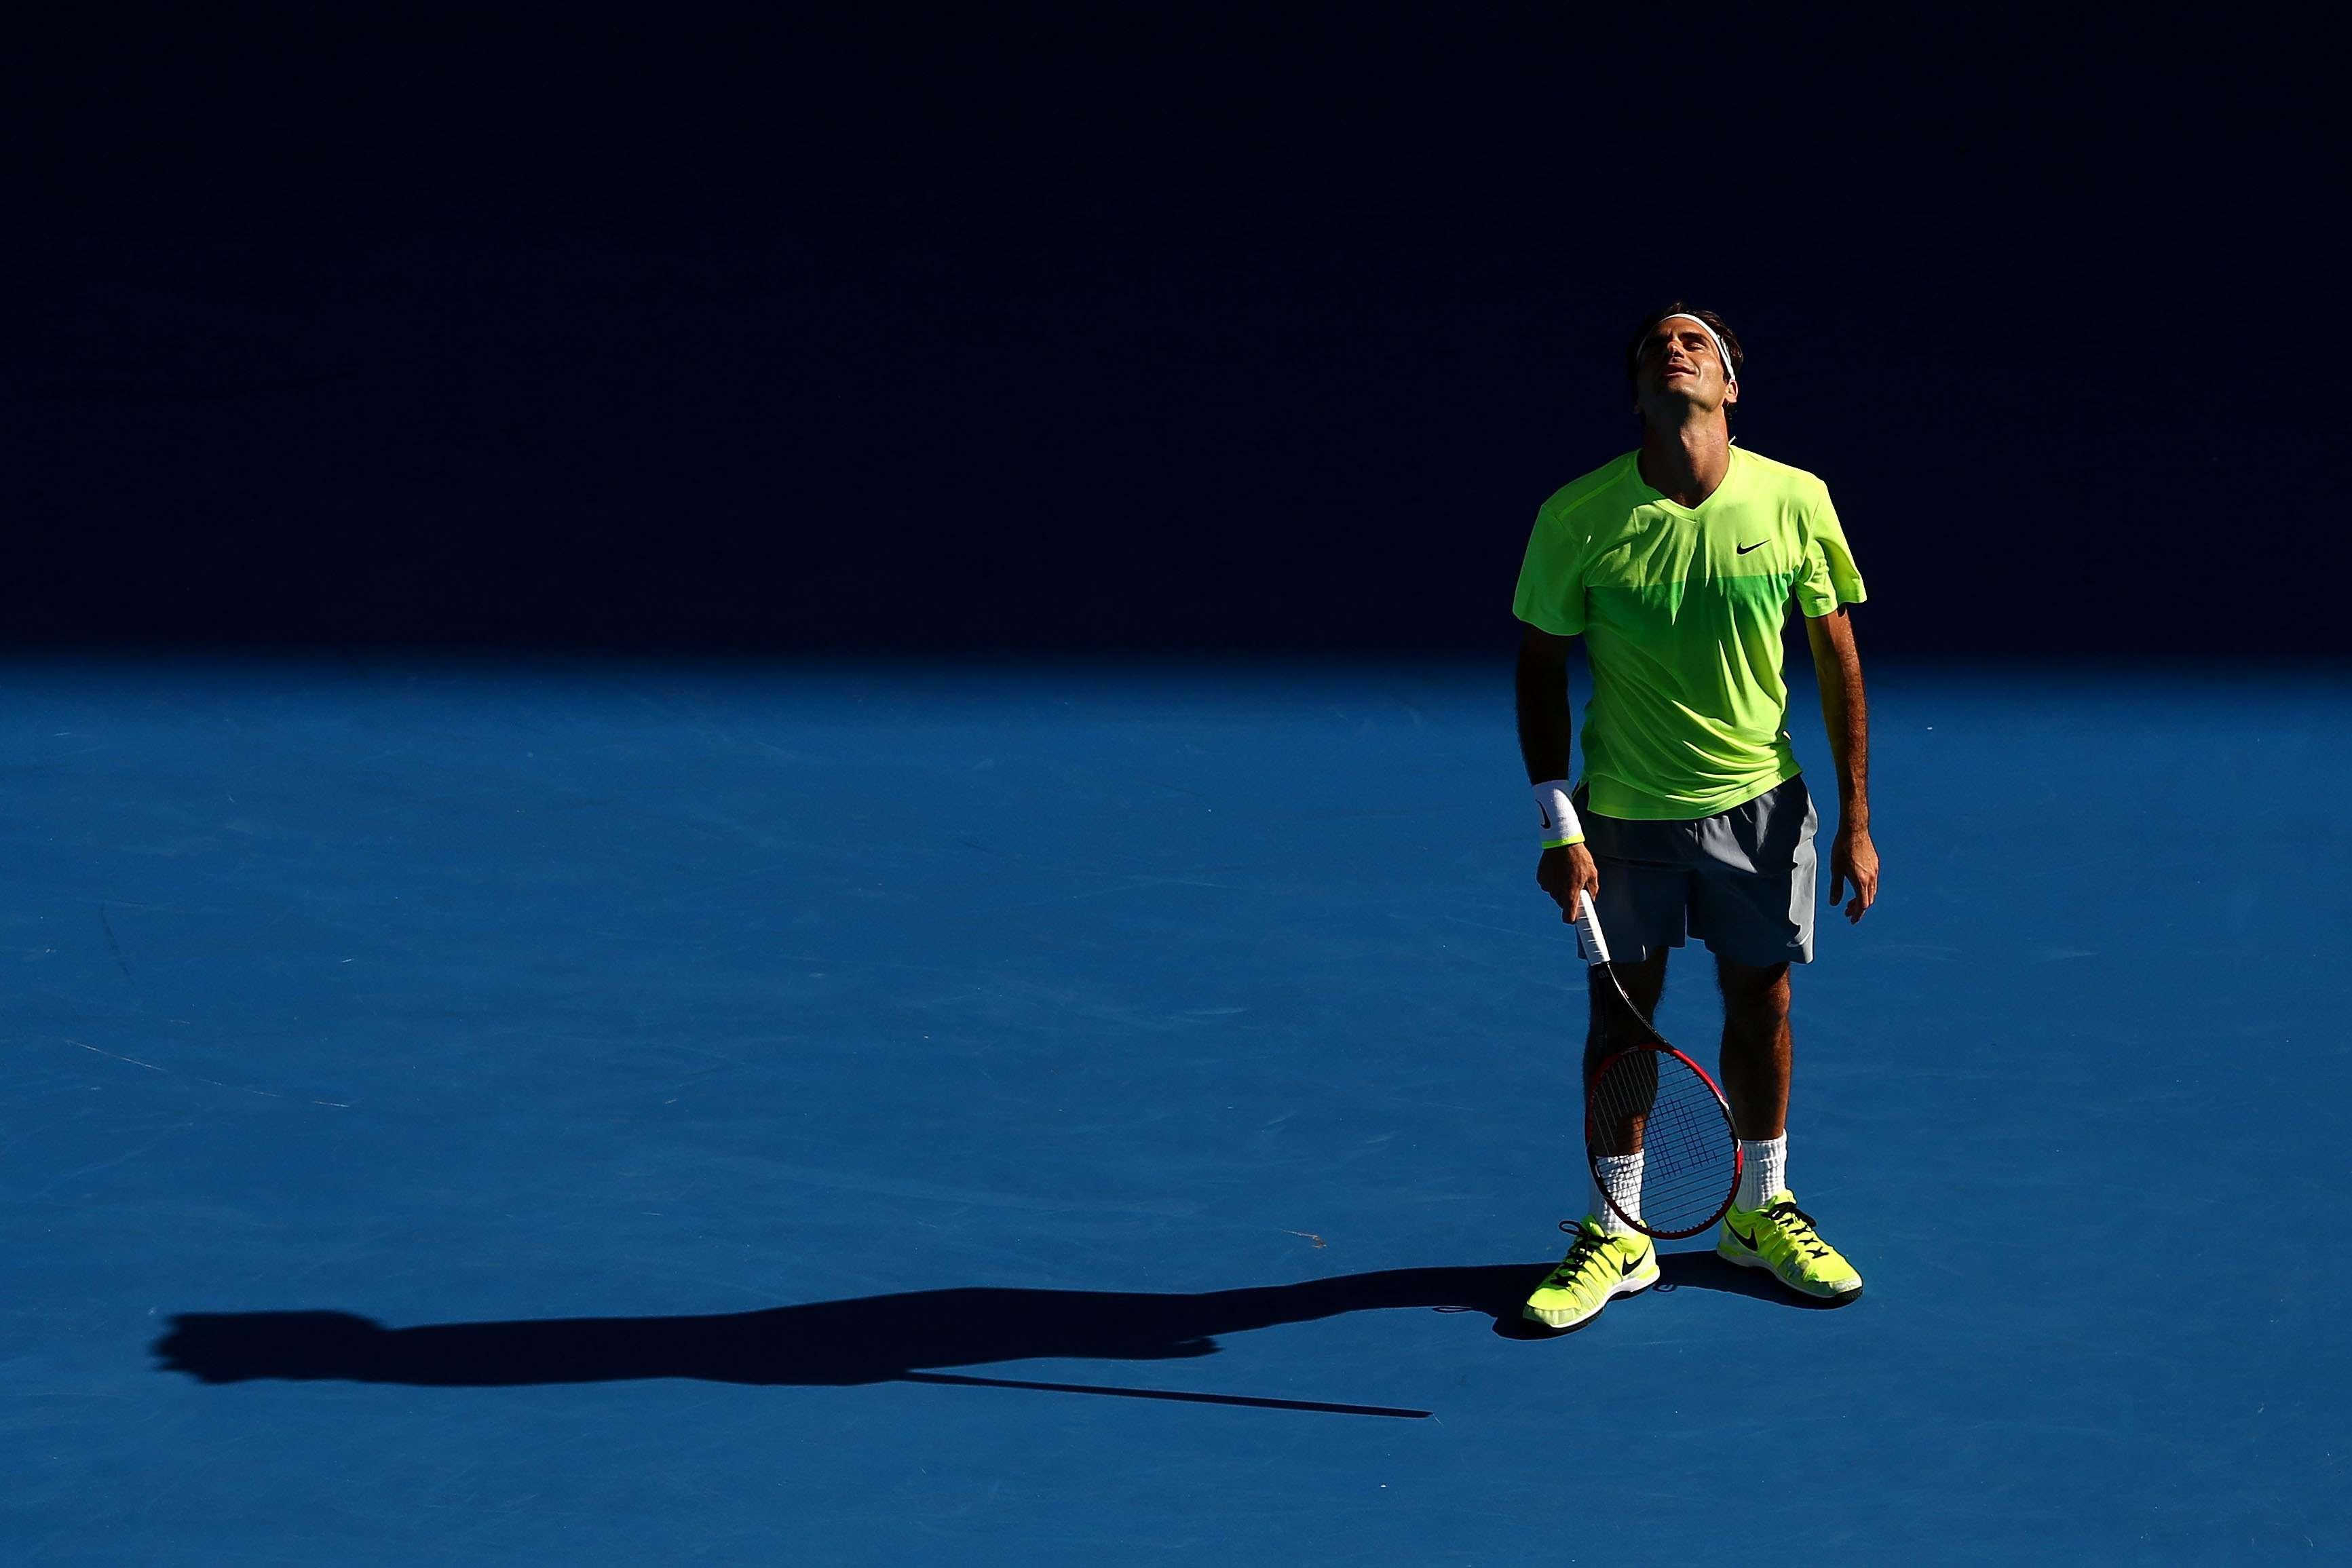 Roger Federer cayó eliminado del Open de Australia. Foto: Getty Images